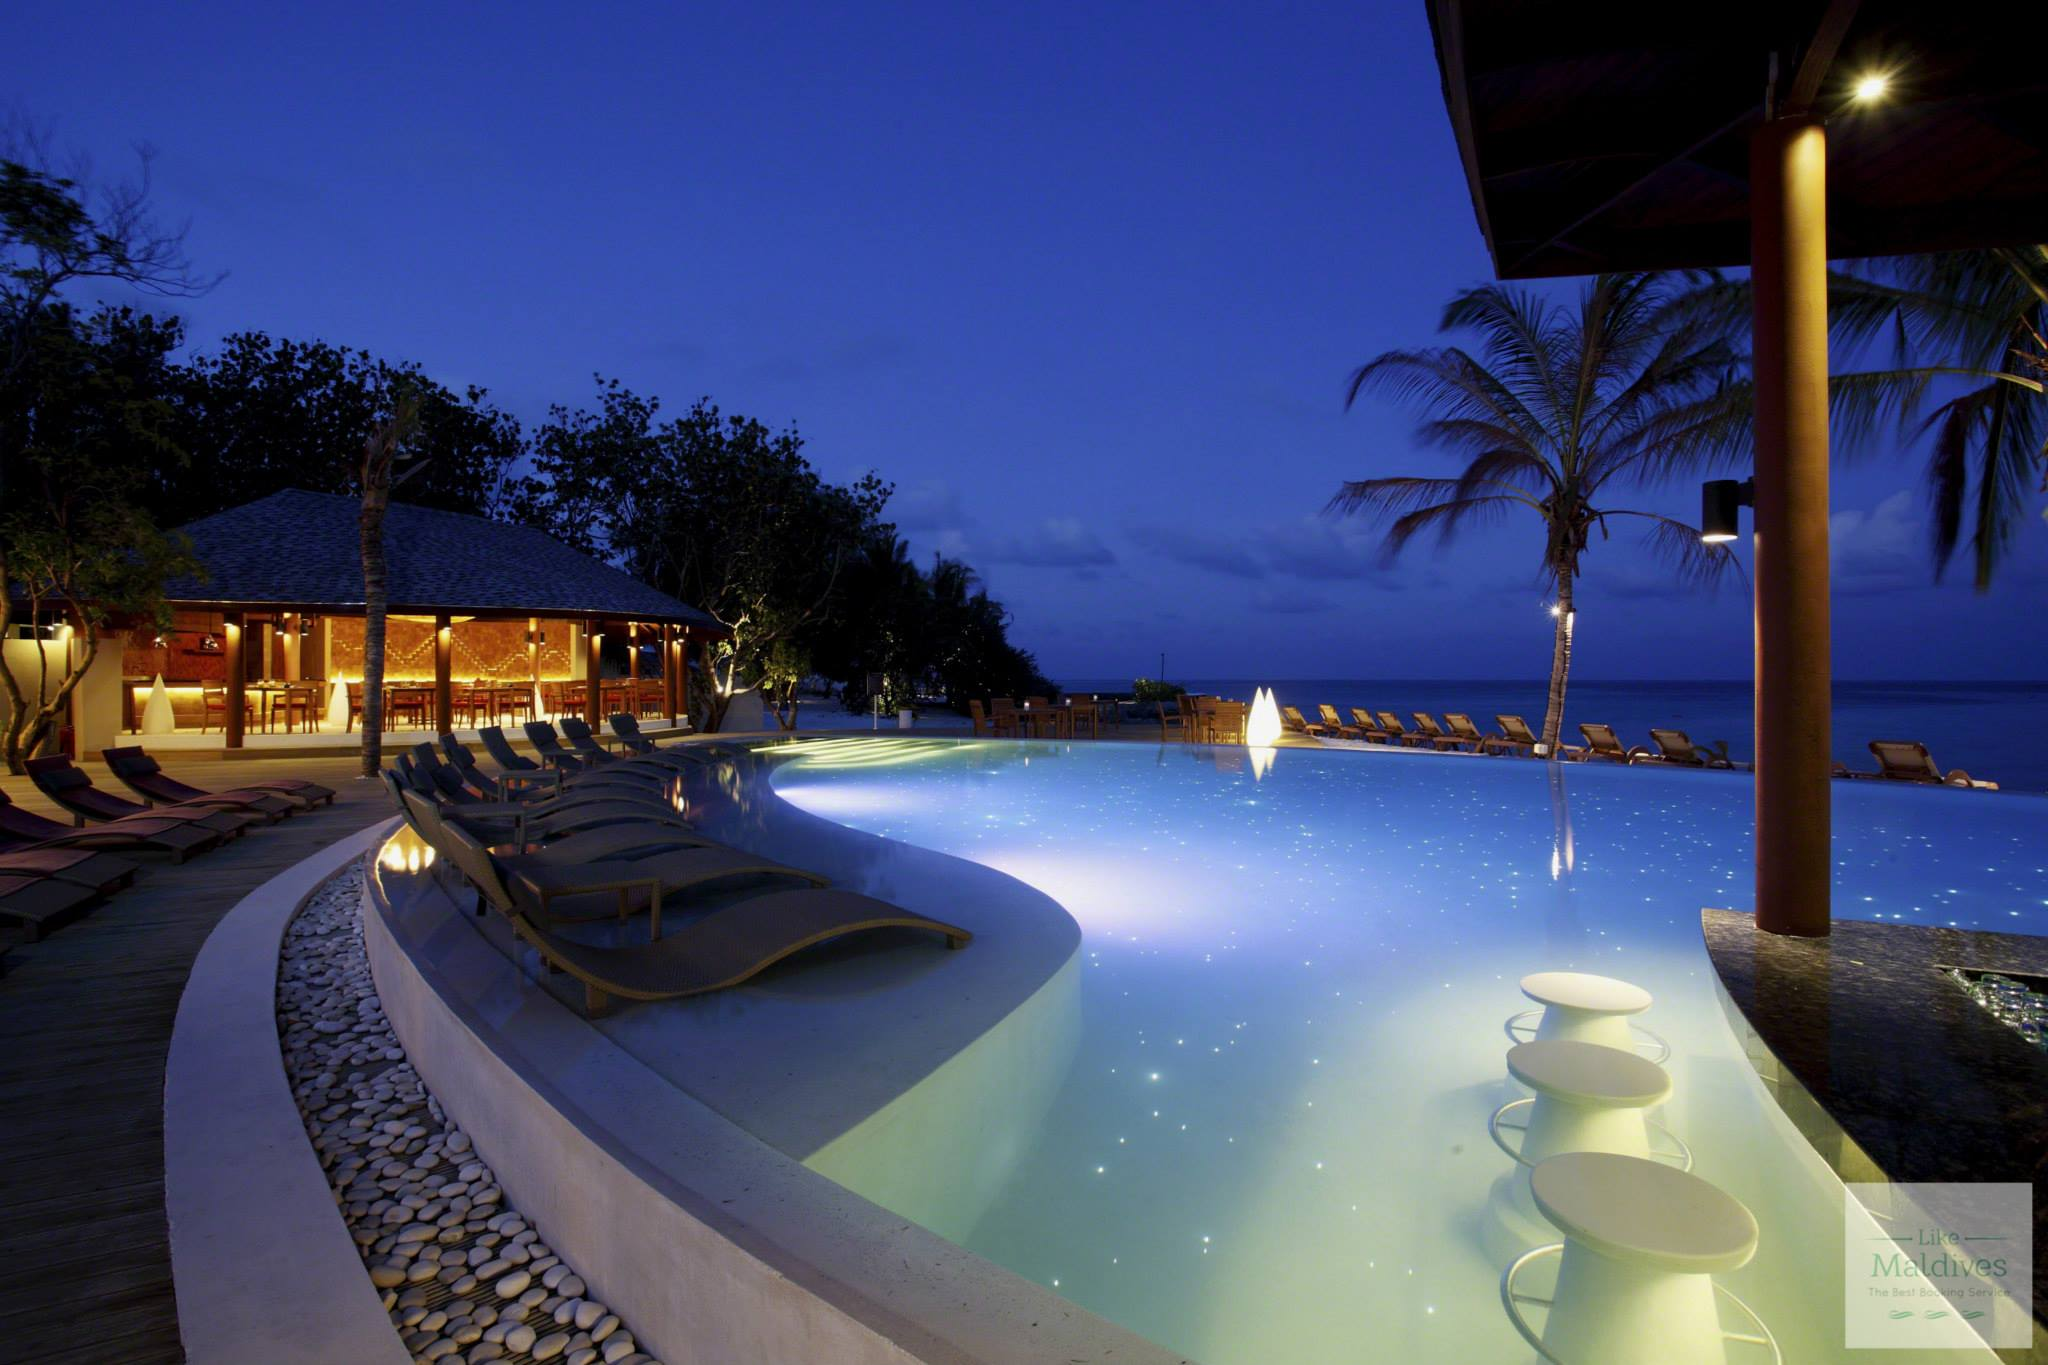 Centara Ras Fushi Resort All Inclusive ไม่รวมตั๋วเครื่องบิน ราคาเริ่มต้น 19,900 บาท